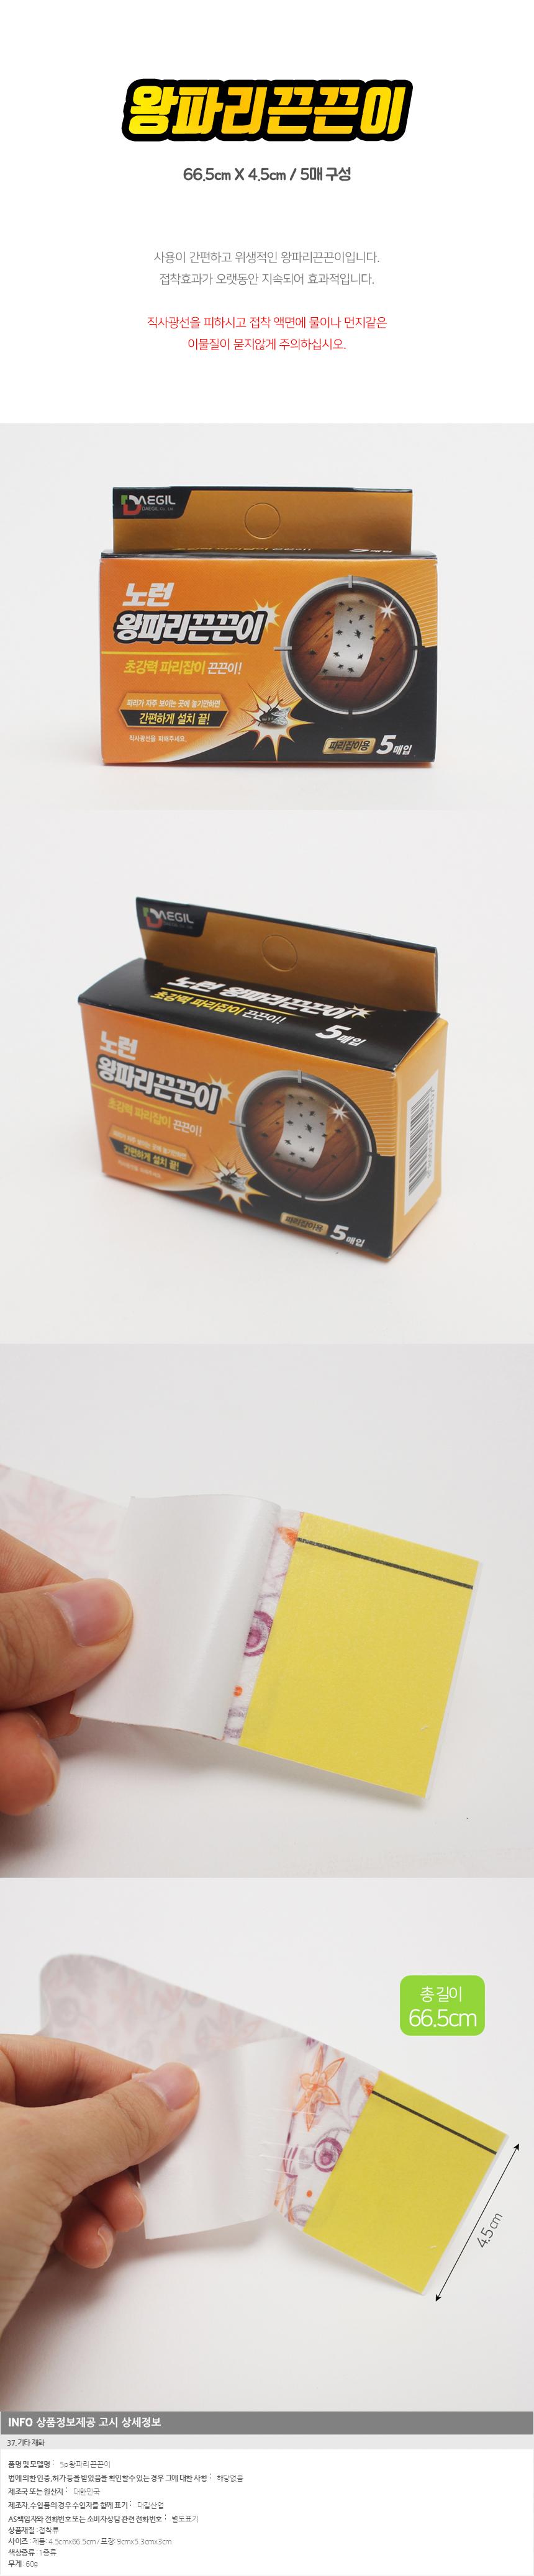 D. 5p 왕파리 끈끈이/잡화점판매용 숙박업체납품용